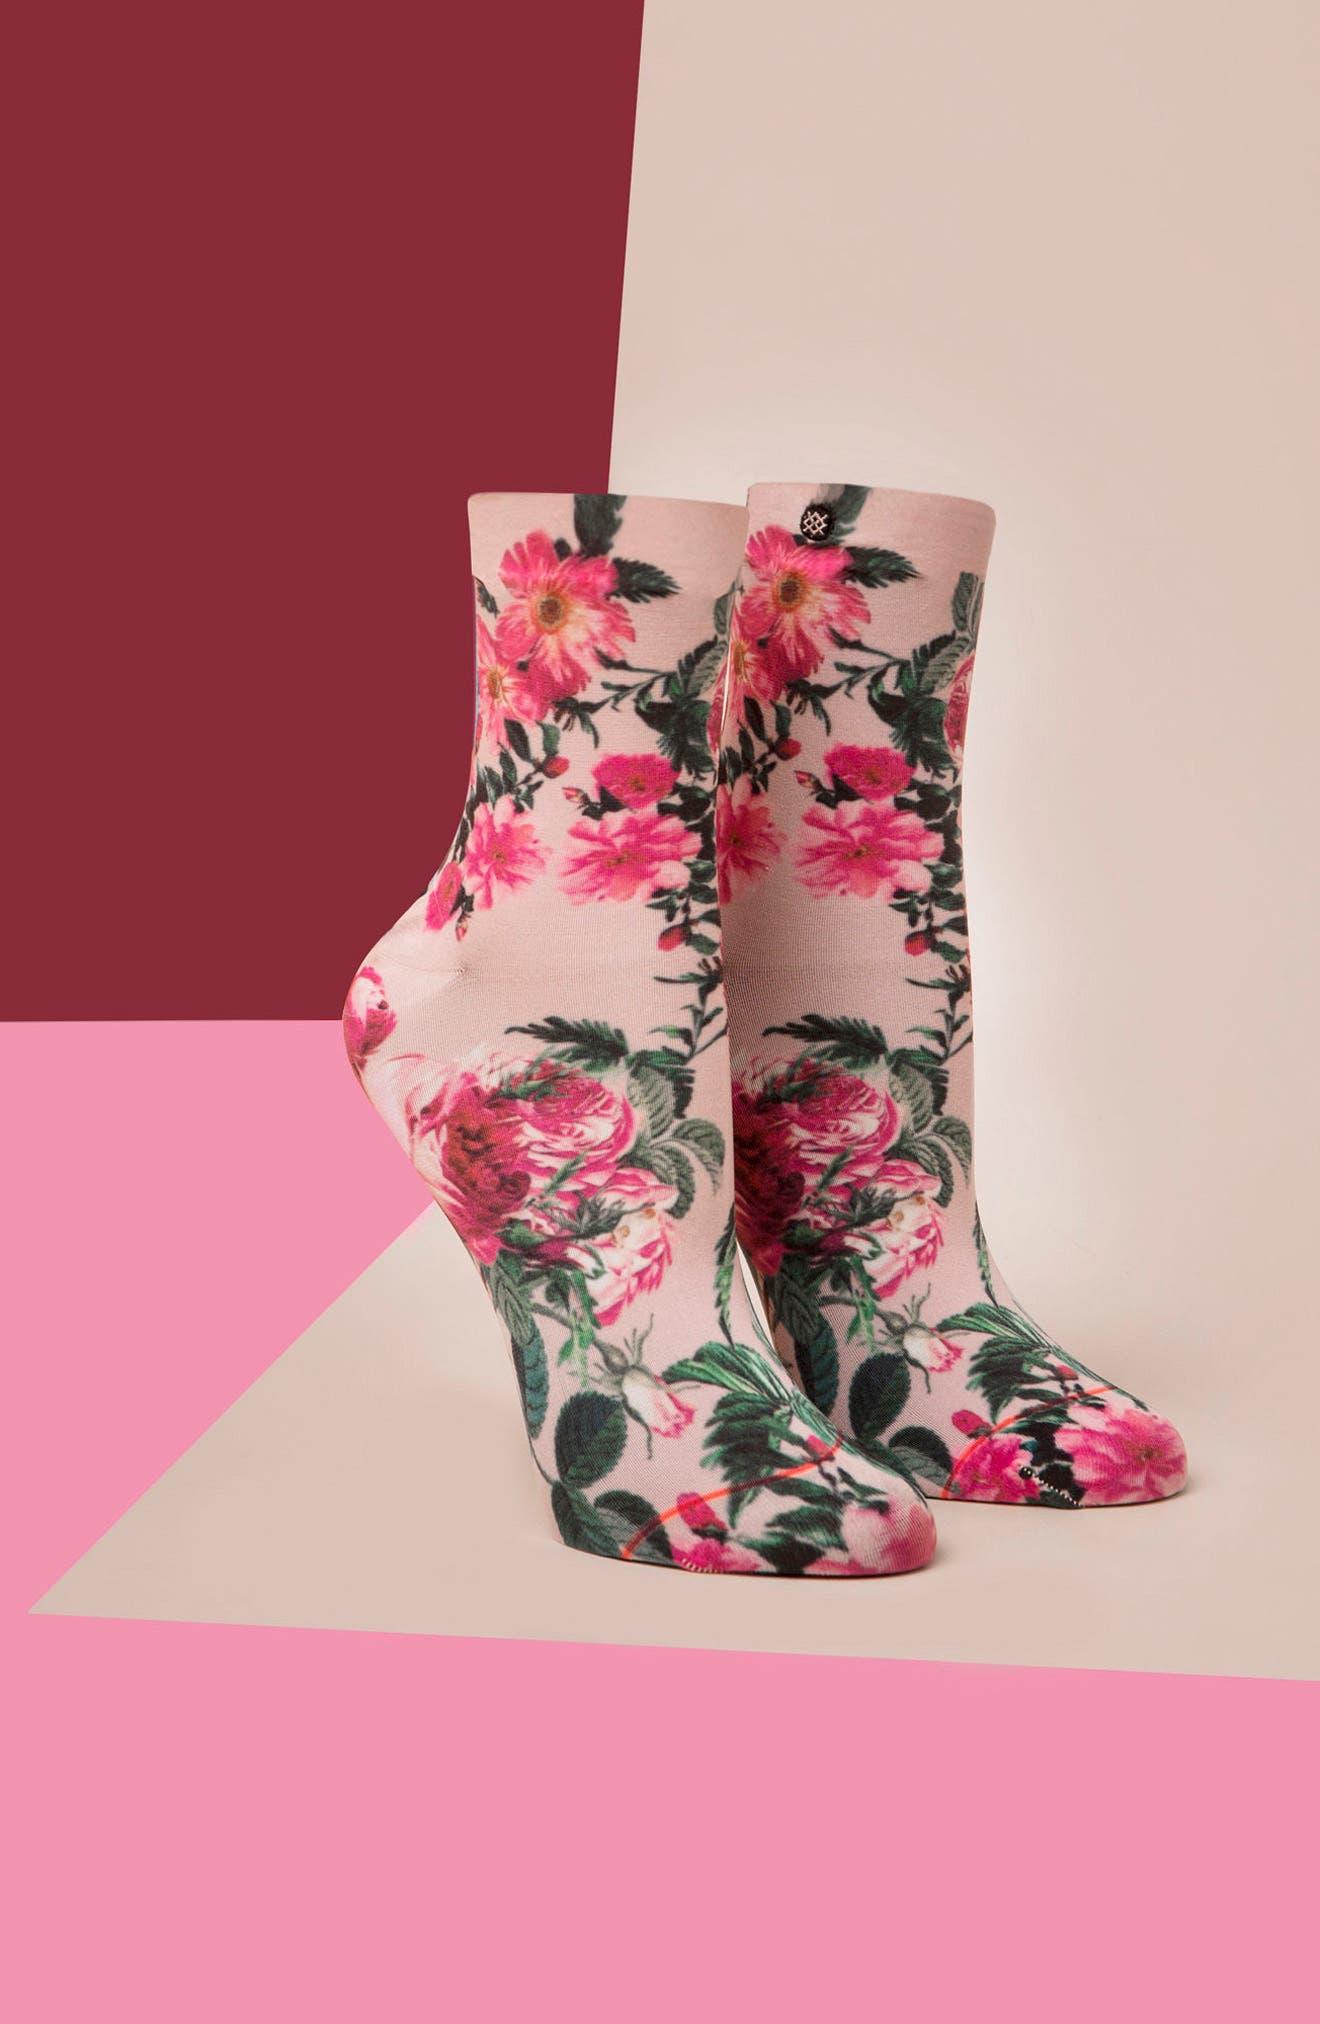 May Flowers Ankle Socks,                             Alternate thumbnail 3, color,                             650